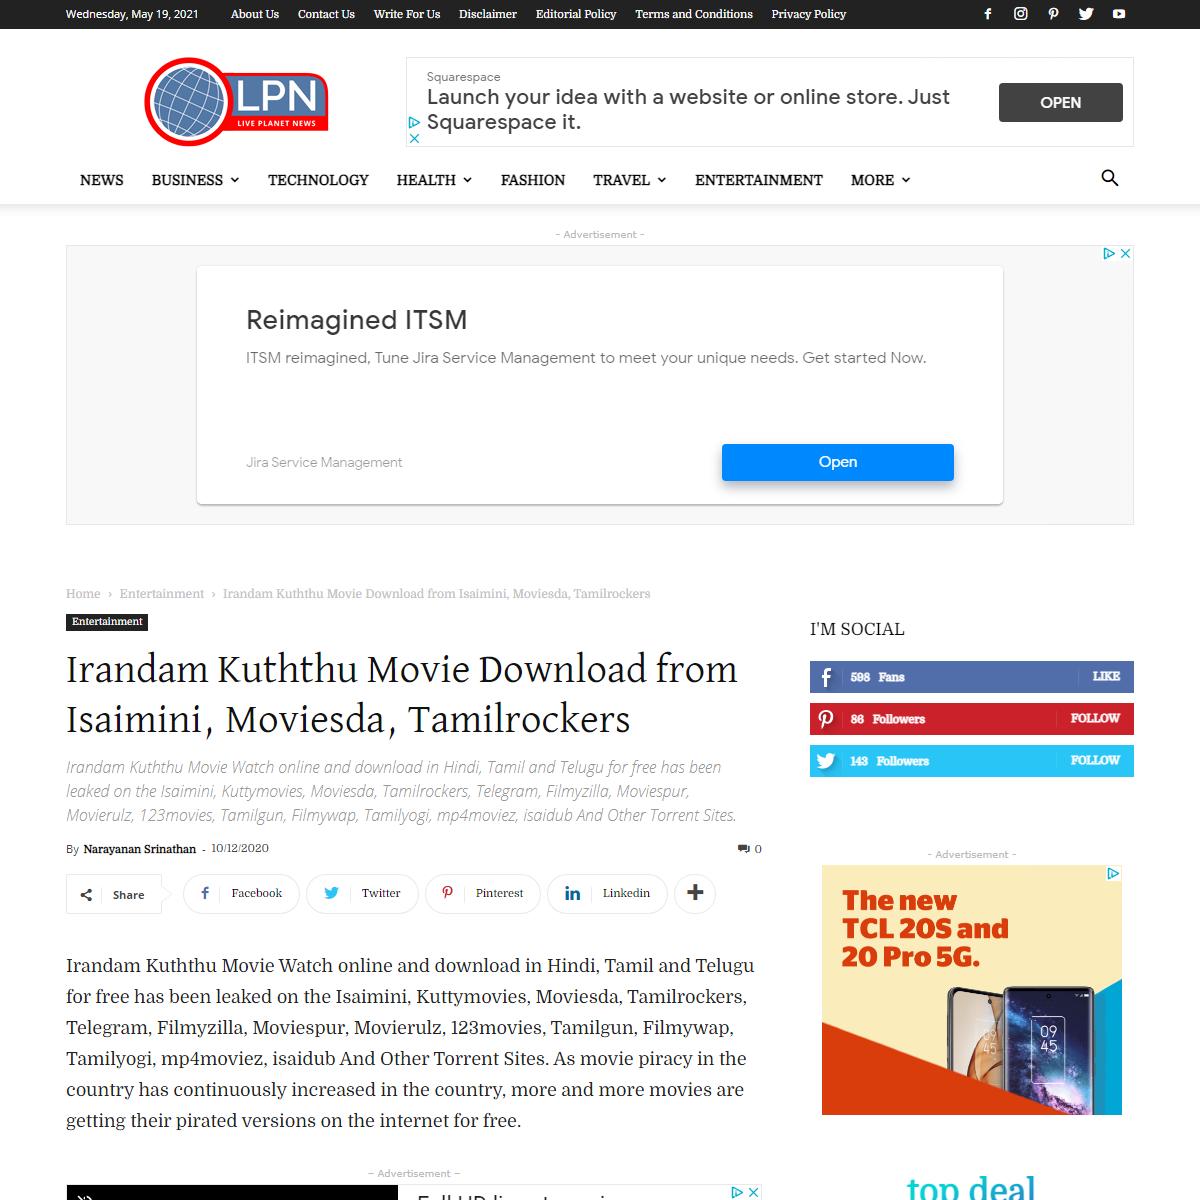 Irandam Kuththu Full Movie Download on Tamilrockers, Isaimini, Moviesda - Live Planet News